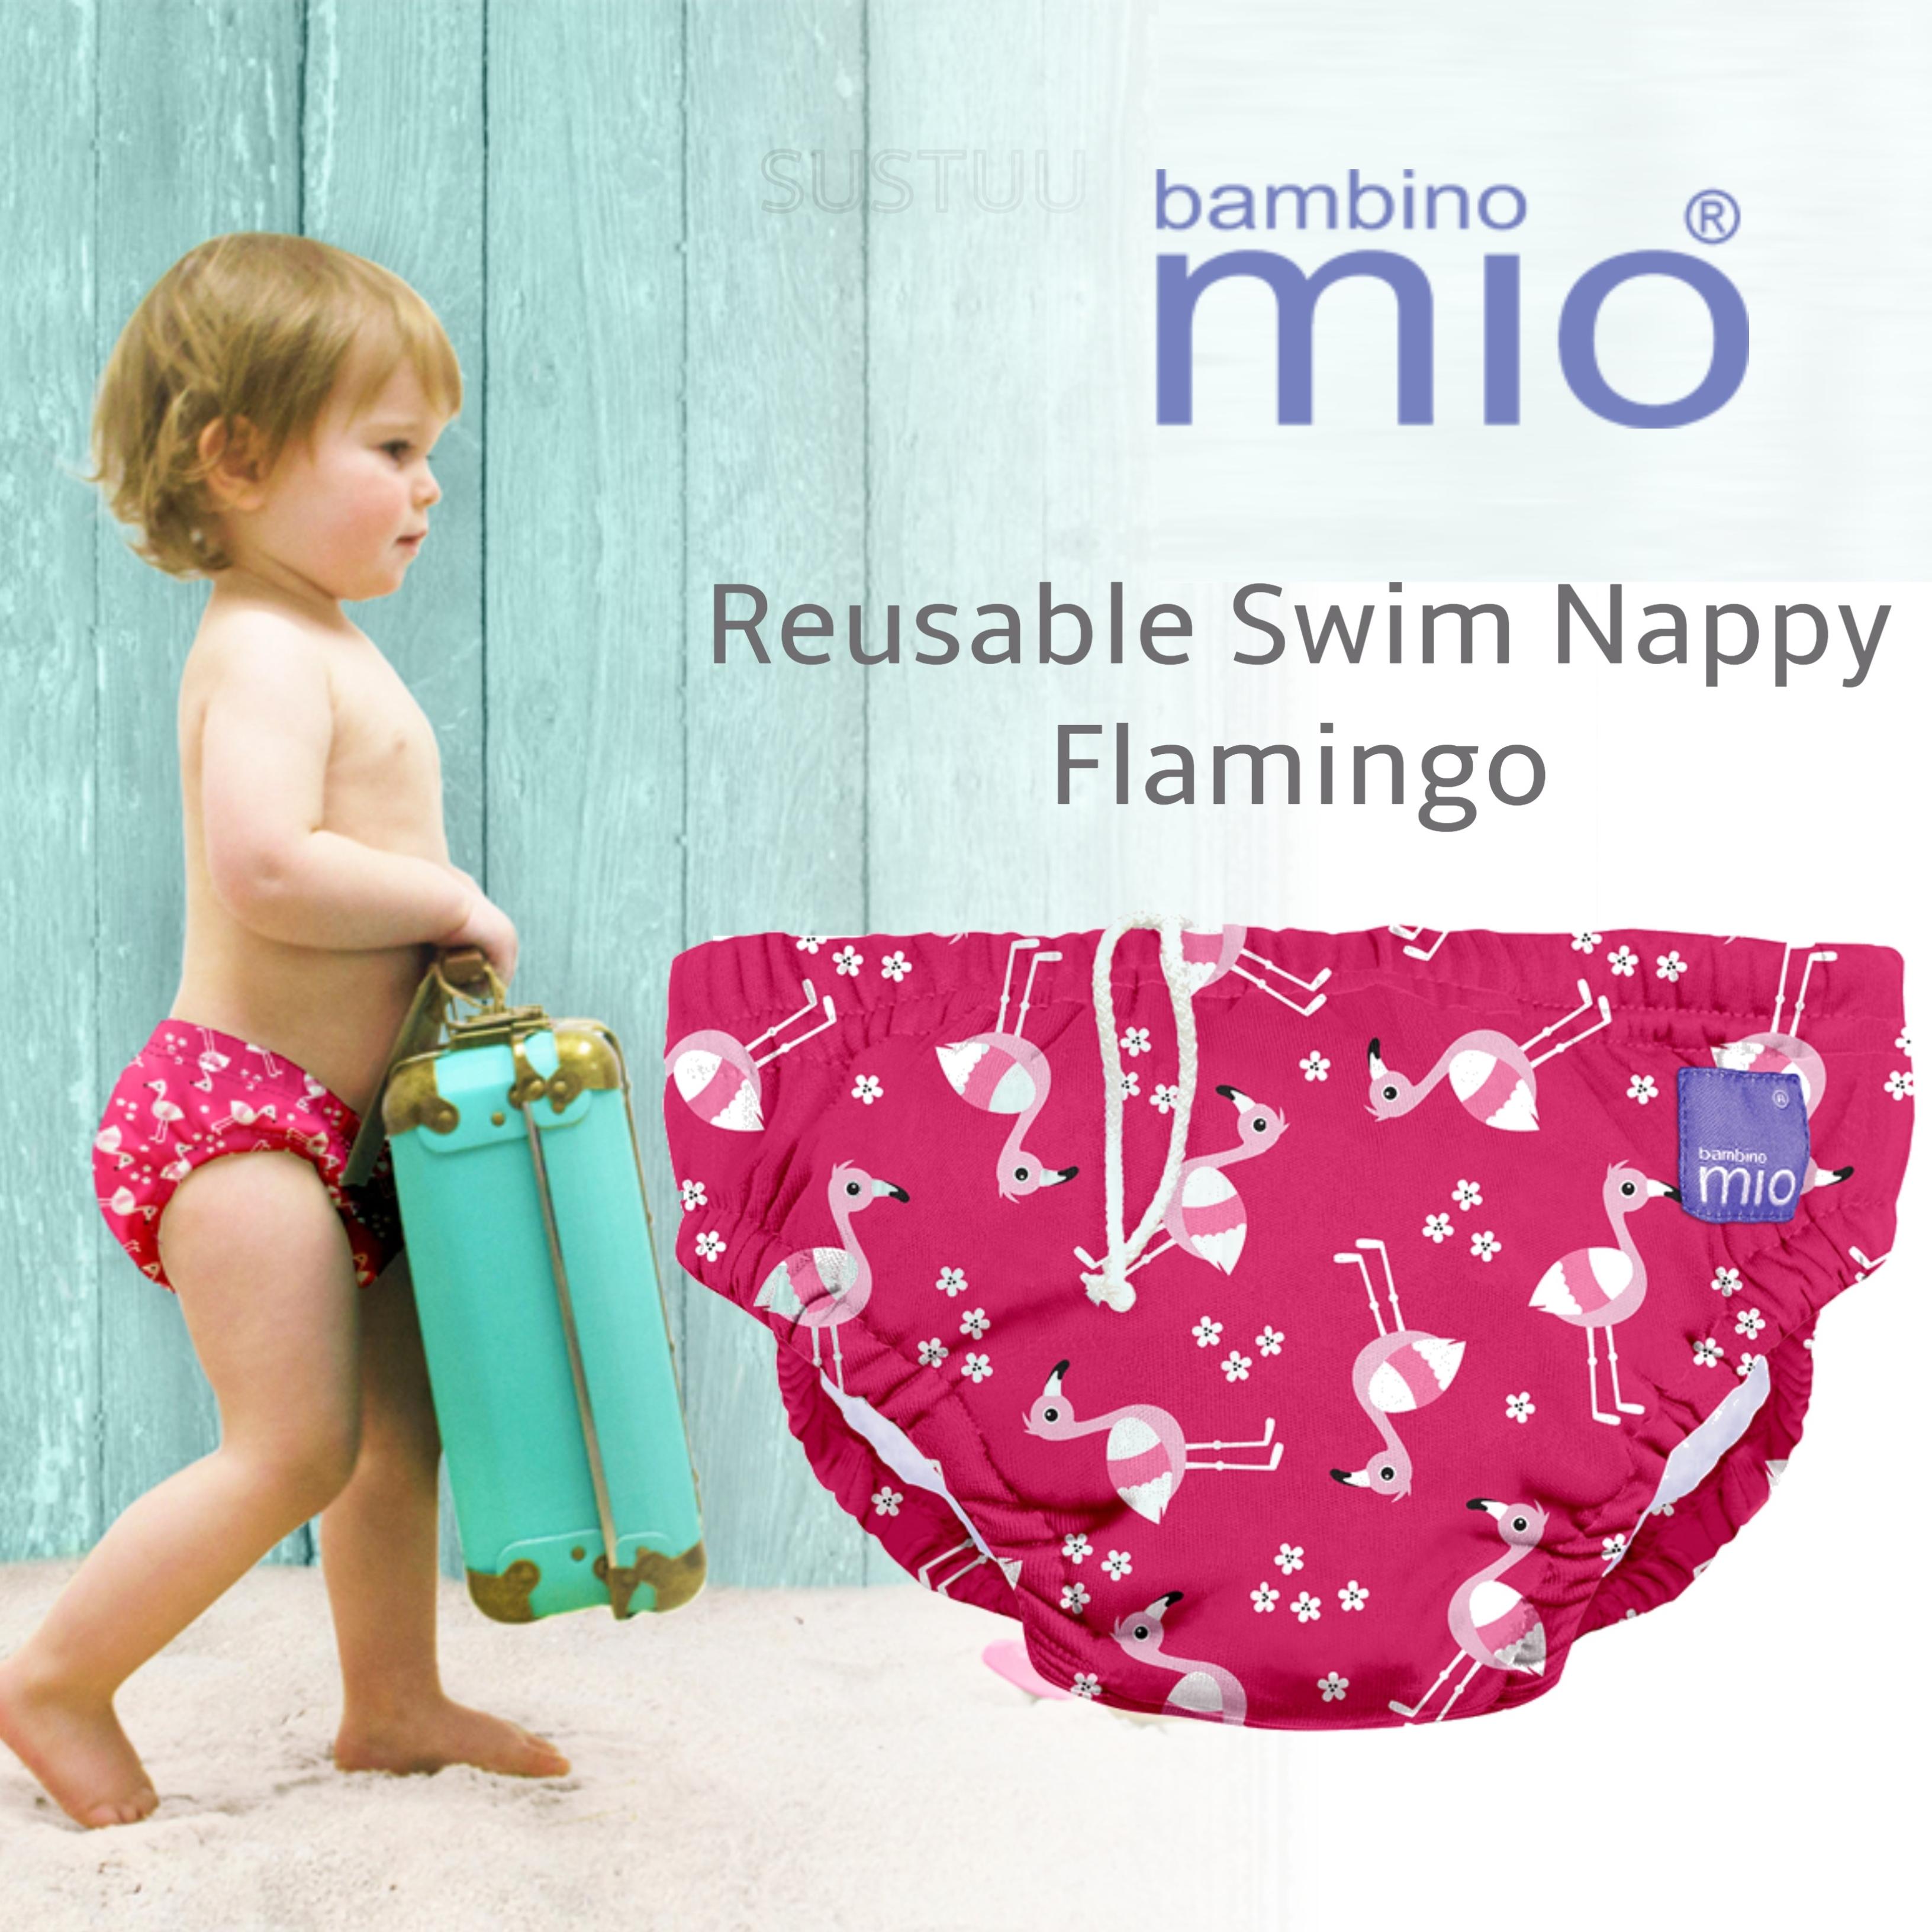 Bambino Mio Reusable Swim Nappy Flamingo|Water Resistant Layer|Soft Cotton|6-12m